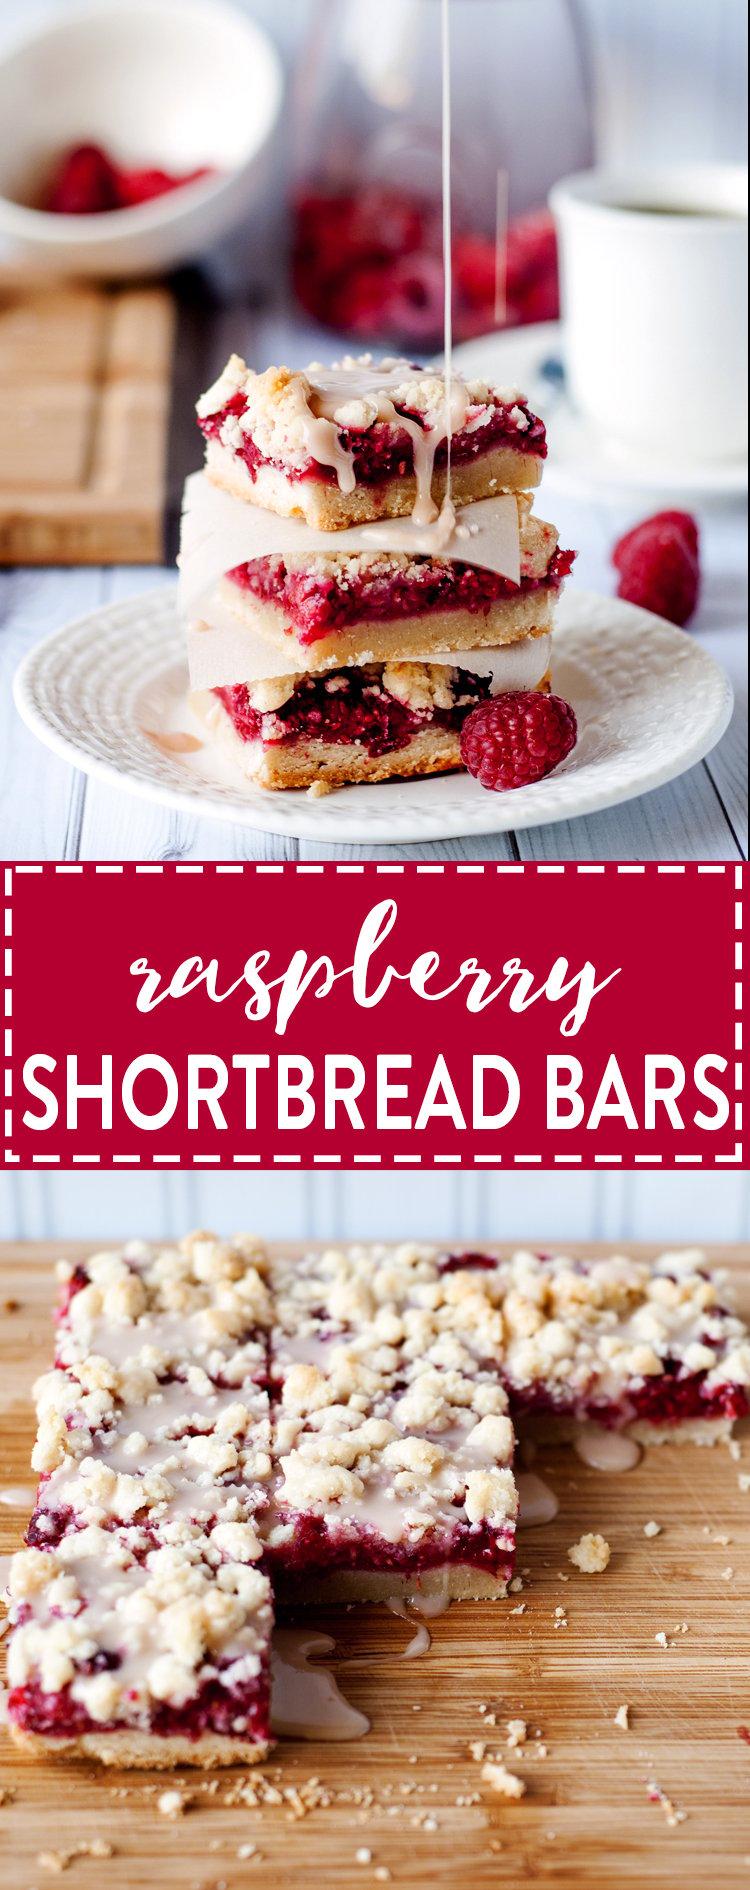 Raspberry Shortbread Bars A Simple Pantry